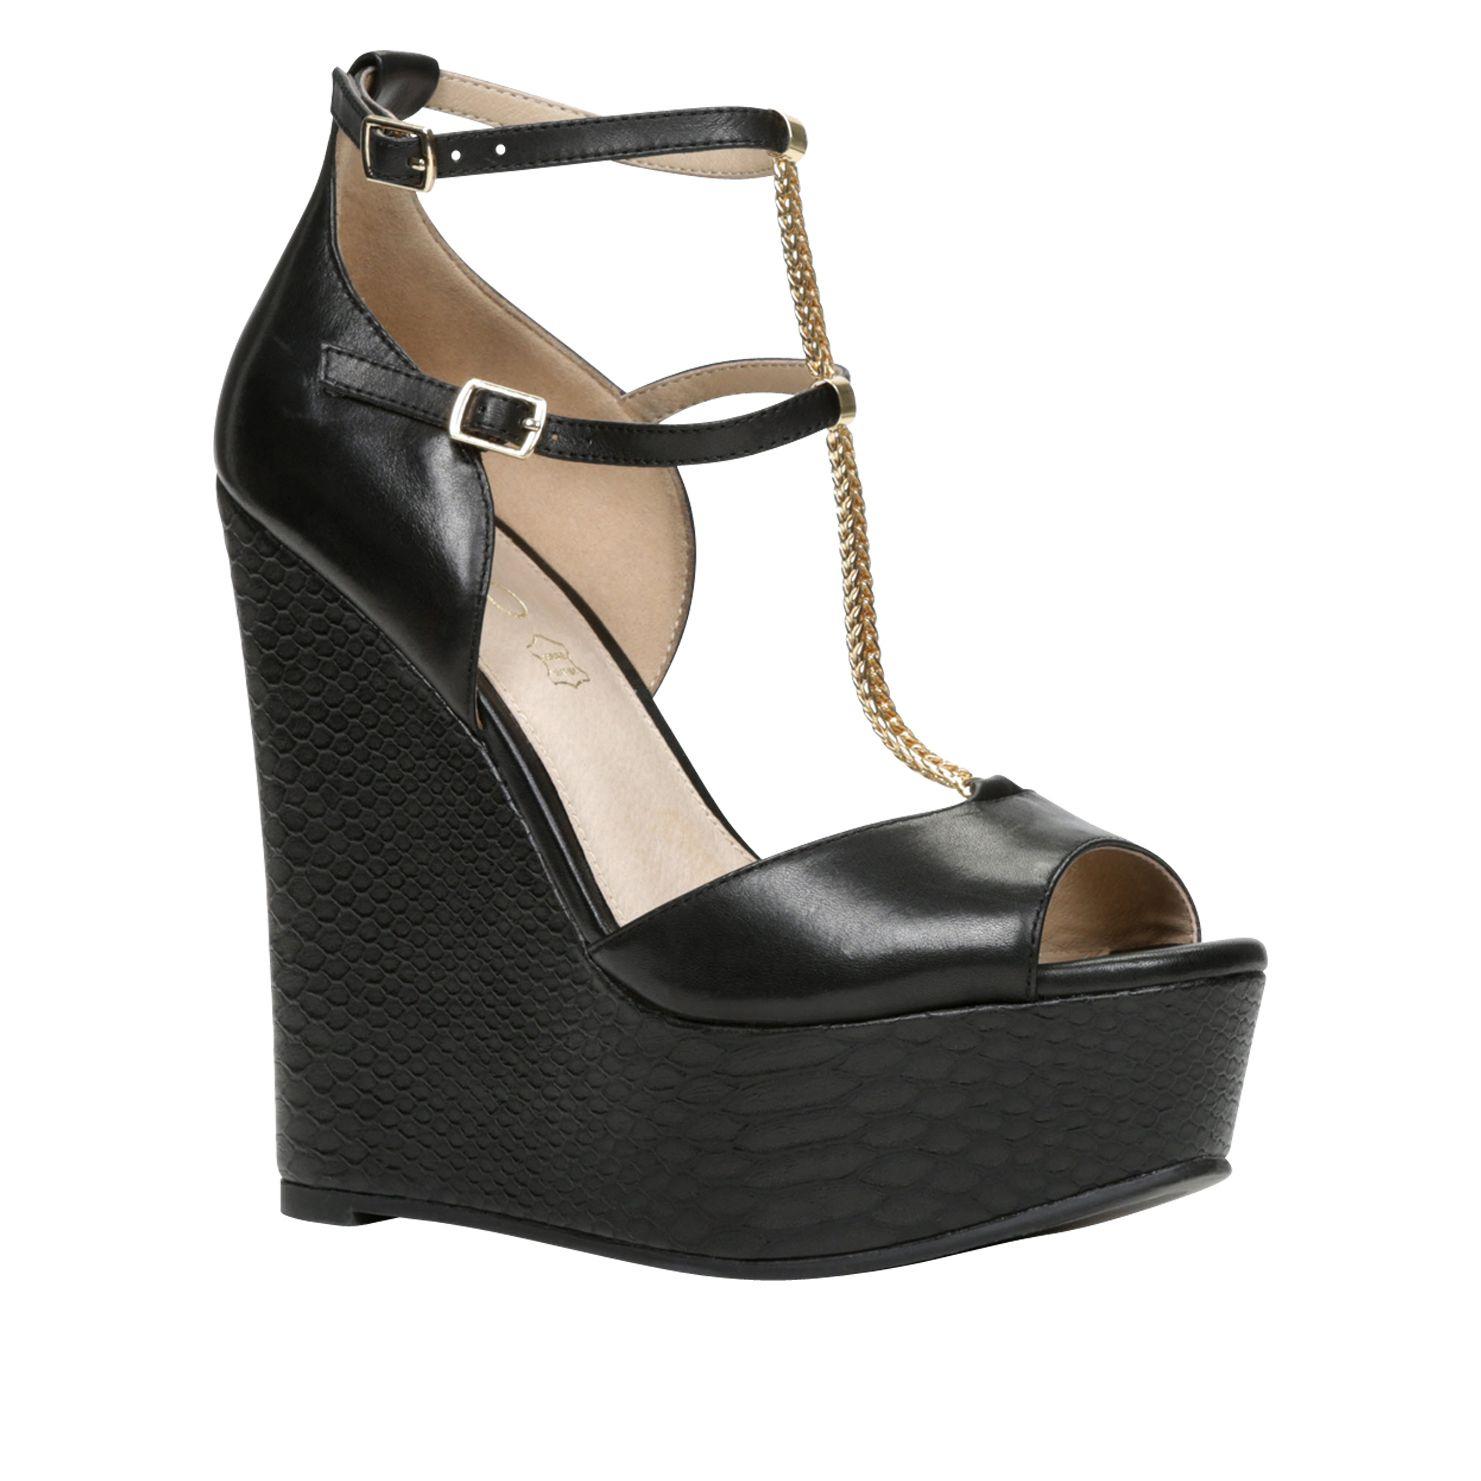 aldo chiesina peep toe wedge sandals in black